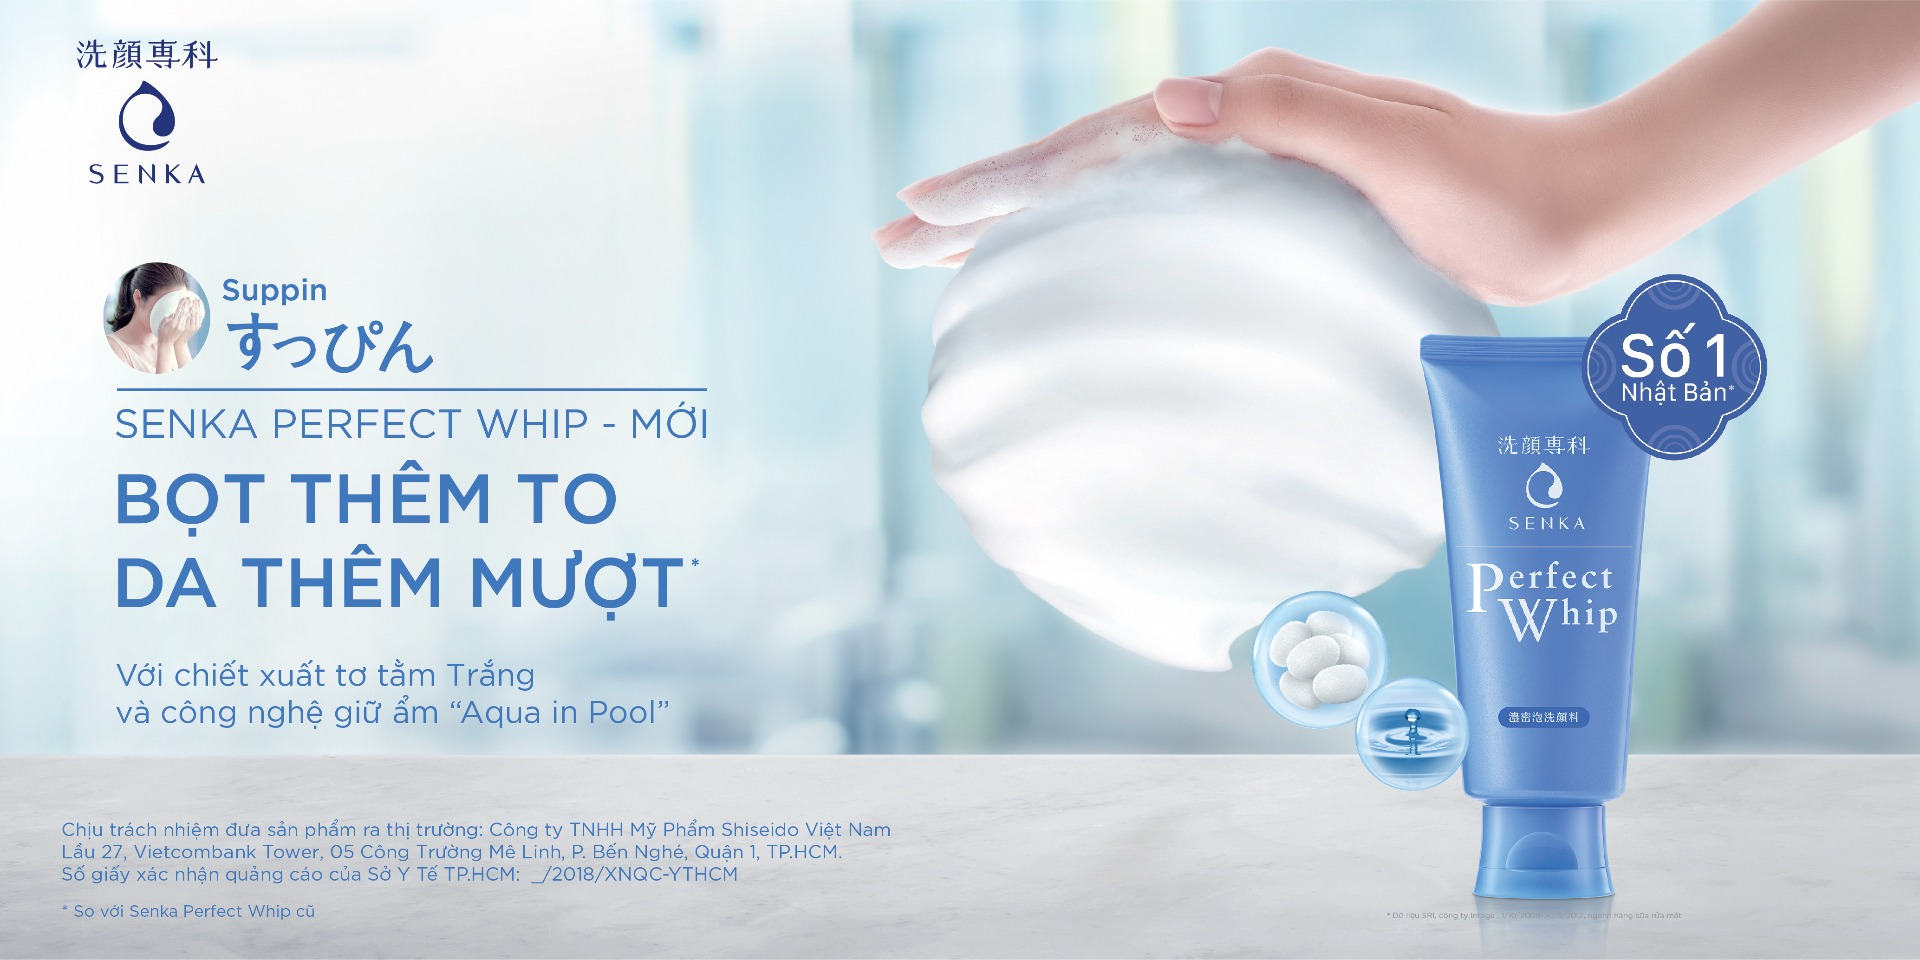 Sữa Rửa Mặt Senka Tạo Bọt Chiết Xuất Tơ Tằm Trắng Perfect Whip Facial Foam Wash